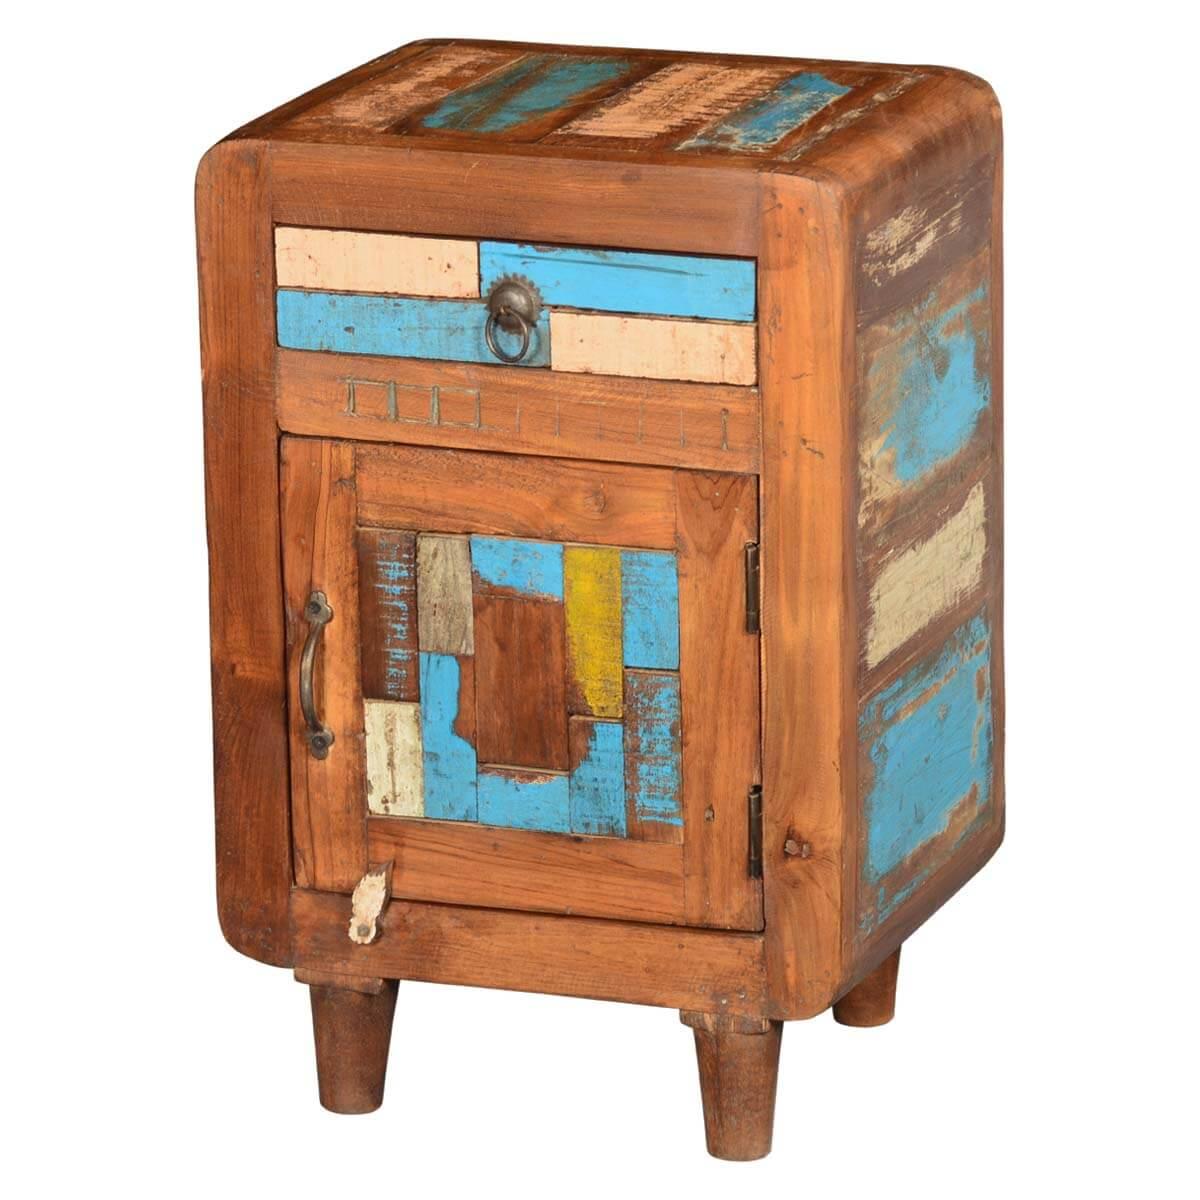 Azalia Rustic Reclaimed Wood 1 Drawer Bedside Nightstand